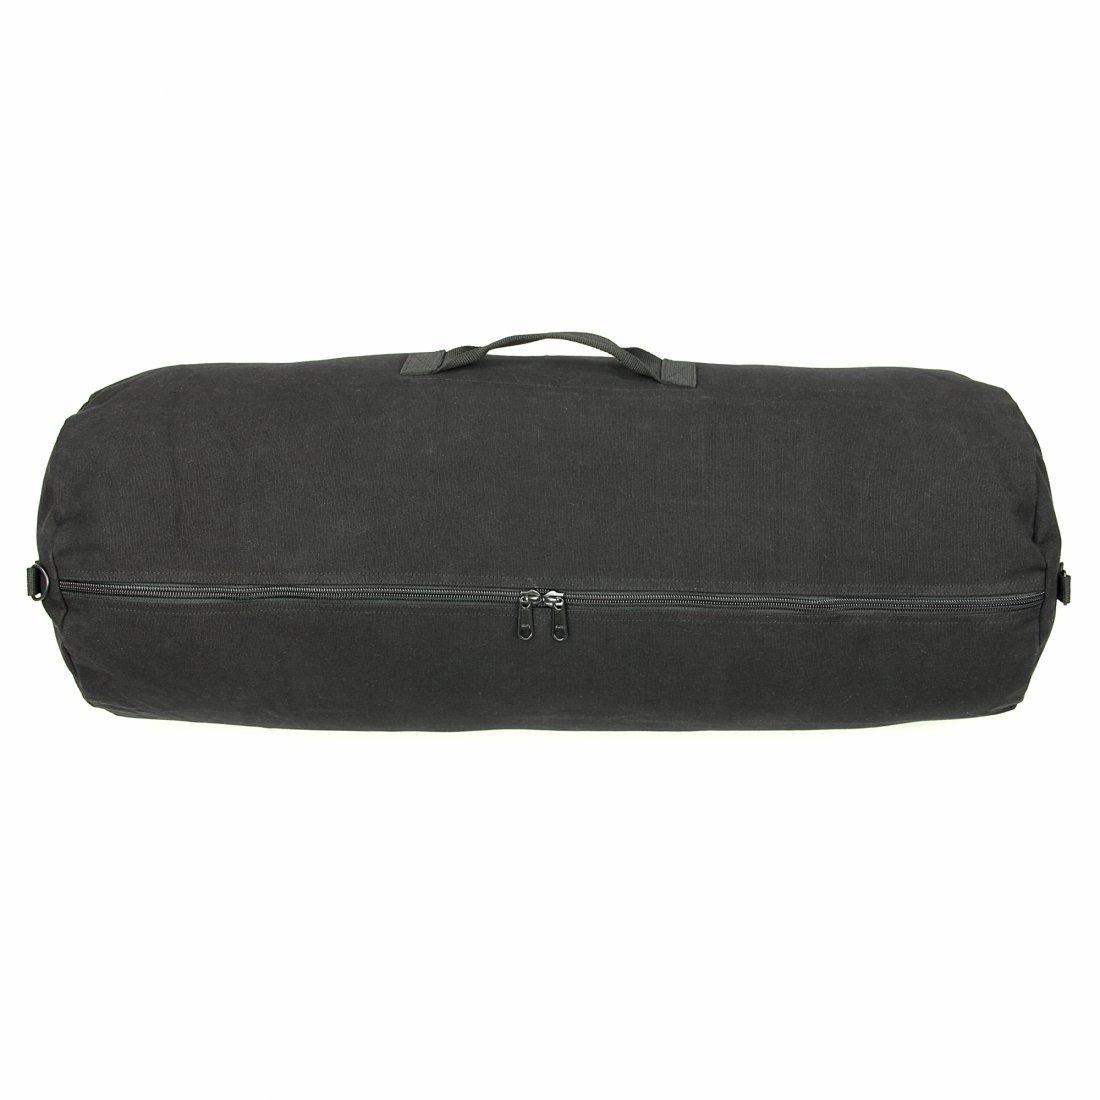 10T Outdoor Equipment RVB Duffle XL - kitbag, travel bag, 215L, Cotton Canvas 625g/m², Ø 47x125 cm, black Saco marinero, 125 215 liters, Negro (Black) 76447